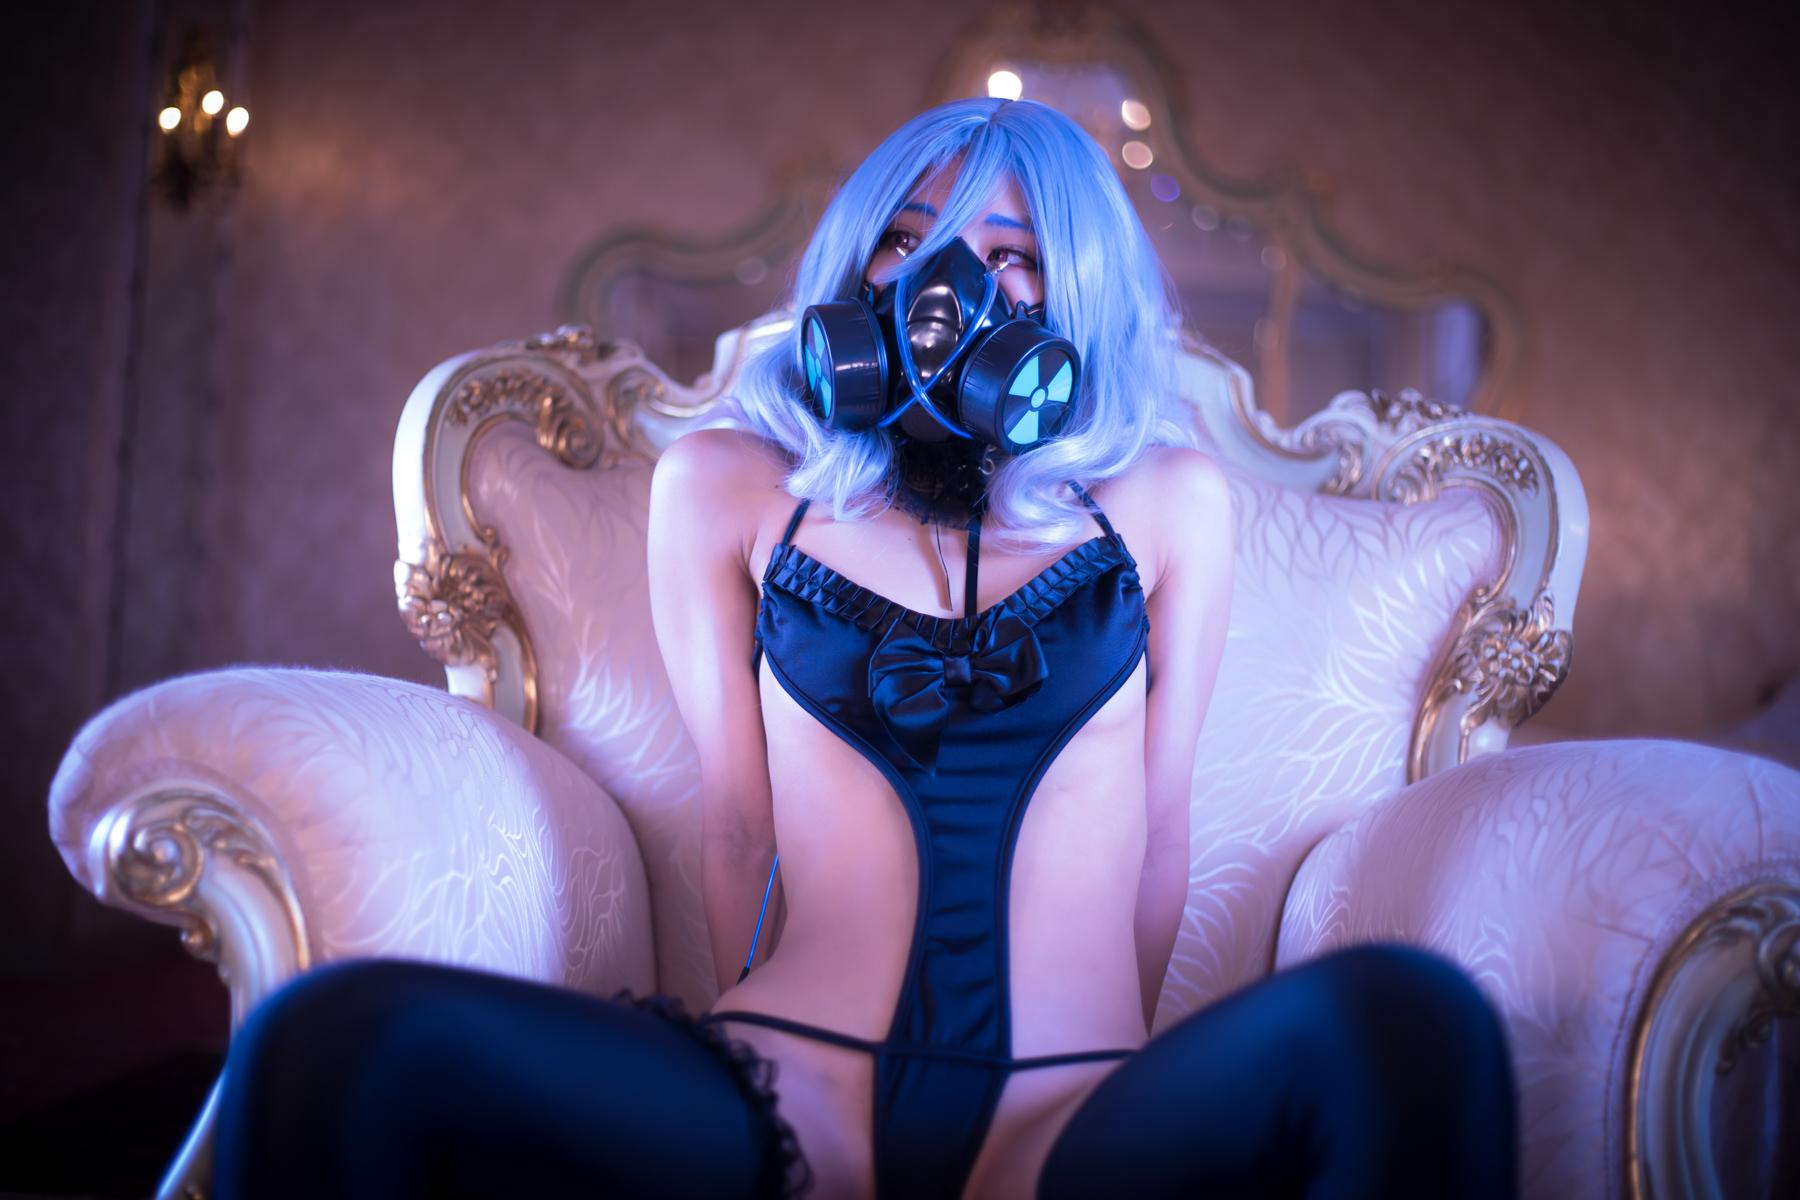 People 1800x1200 women model Asian Shitai-chan Japanese Japanese women gas masks blue hair short hair women indoors